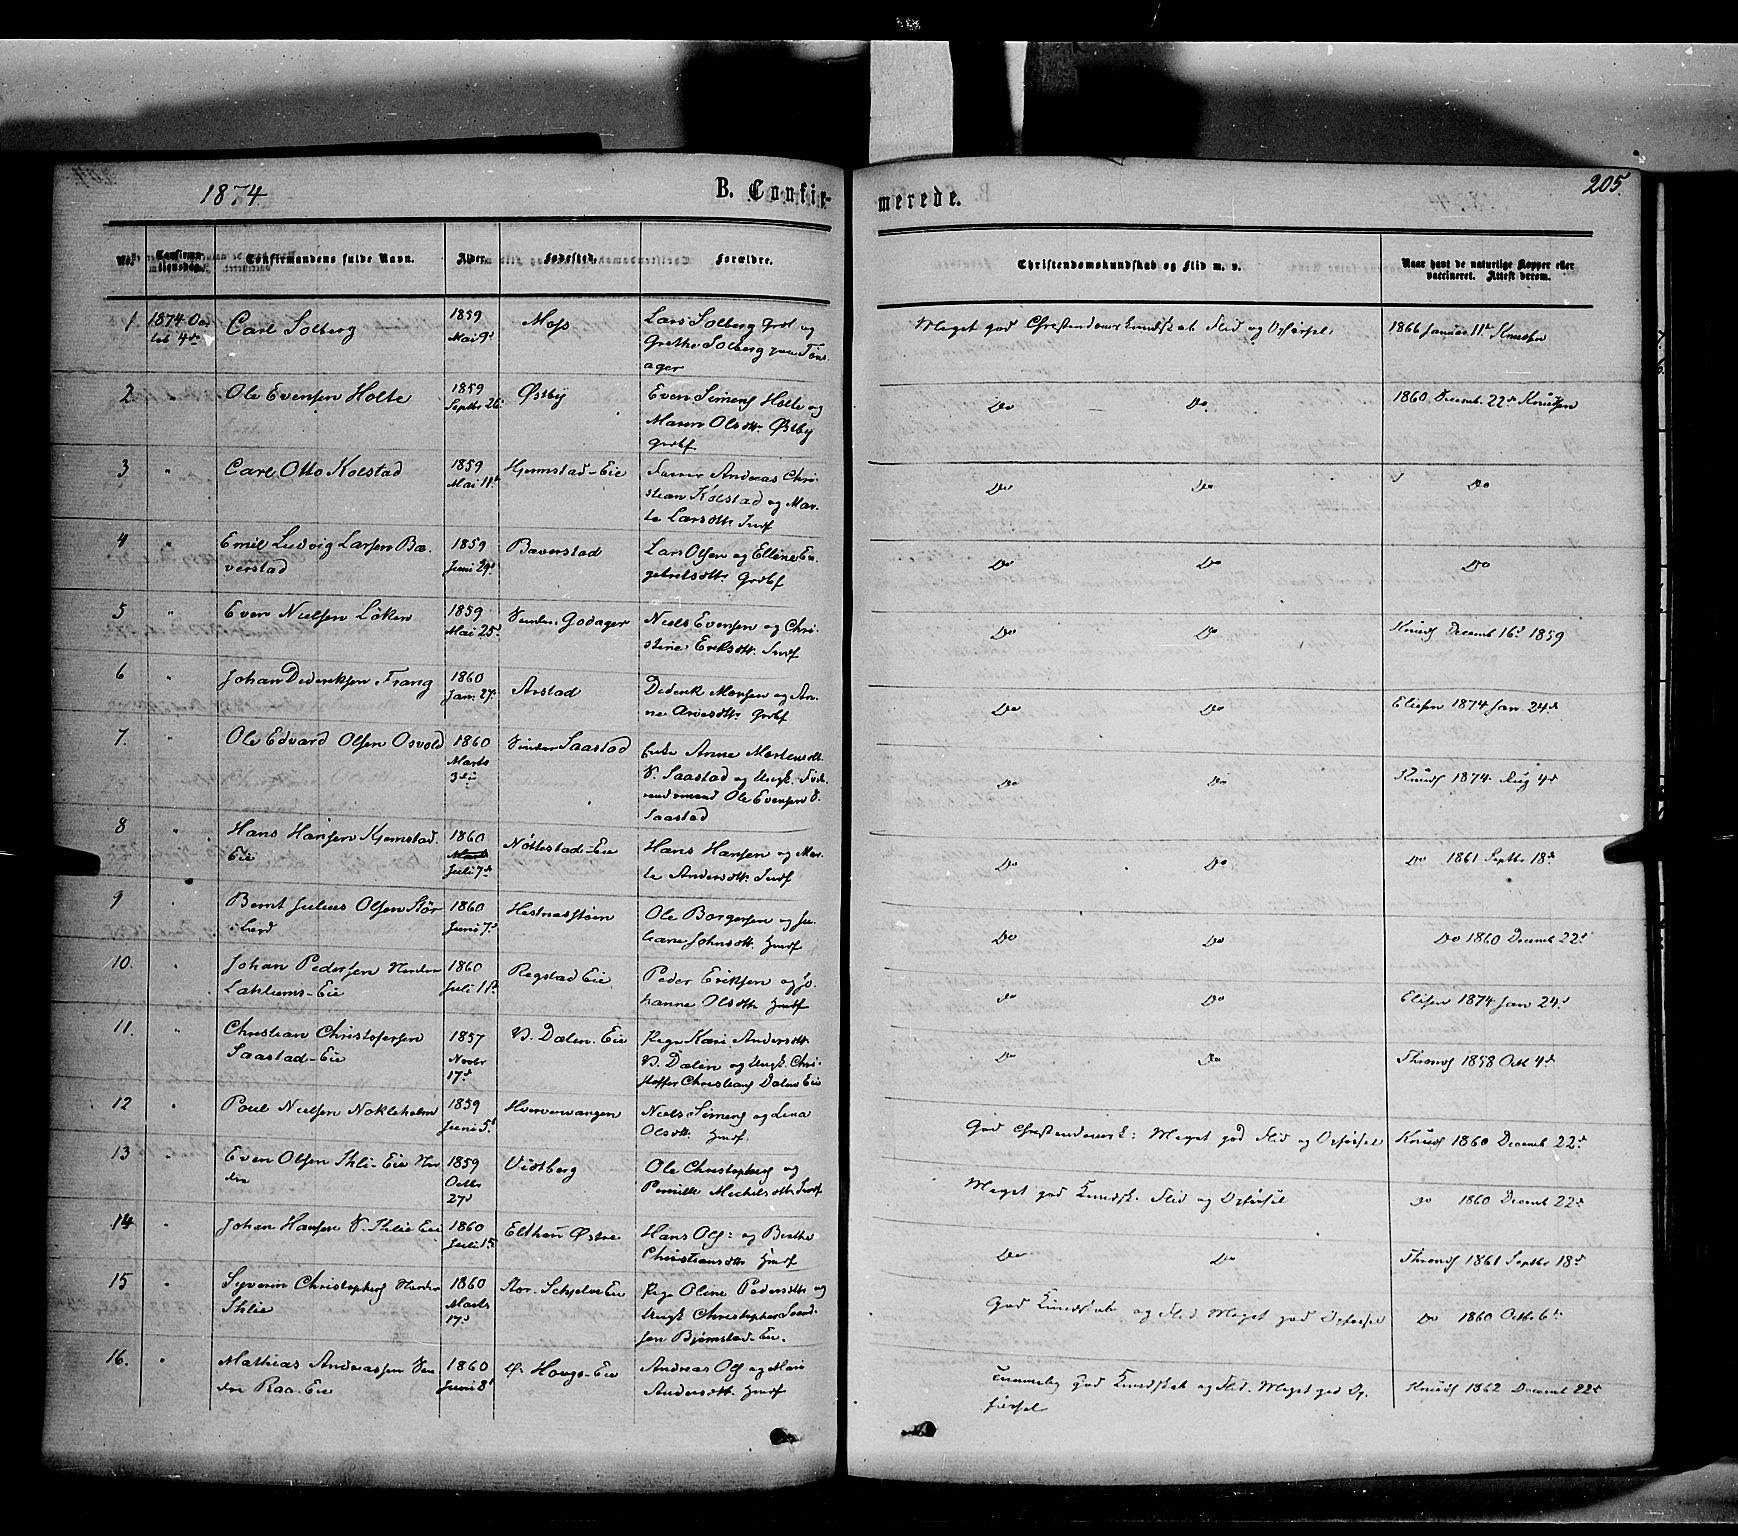 SAH, Stange prestekontor, K/L0013: Ministerialbok nr. 13, 1862-1879, s. 205